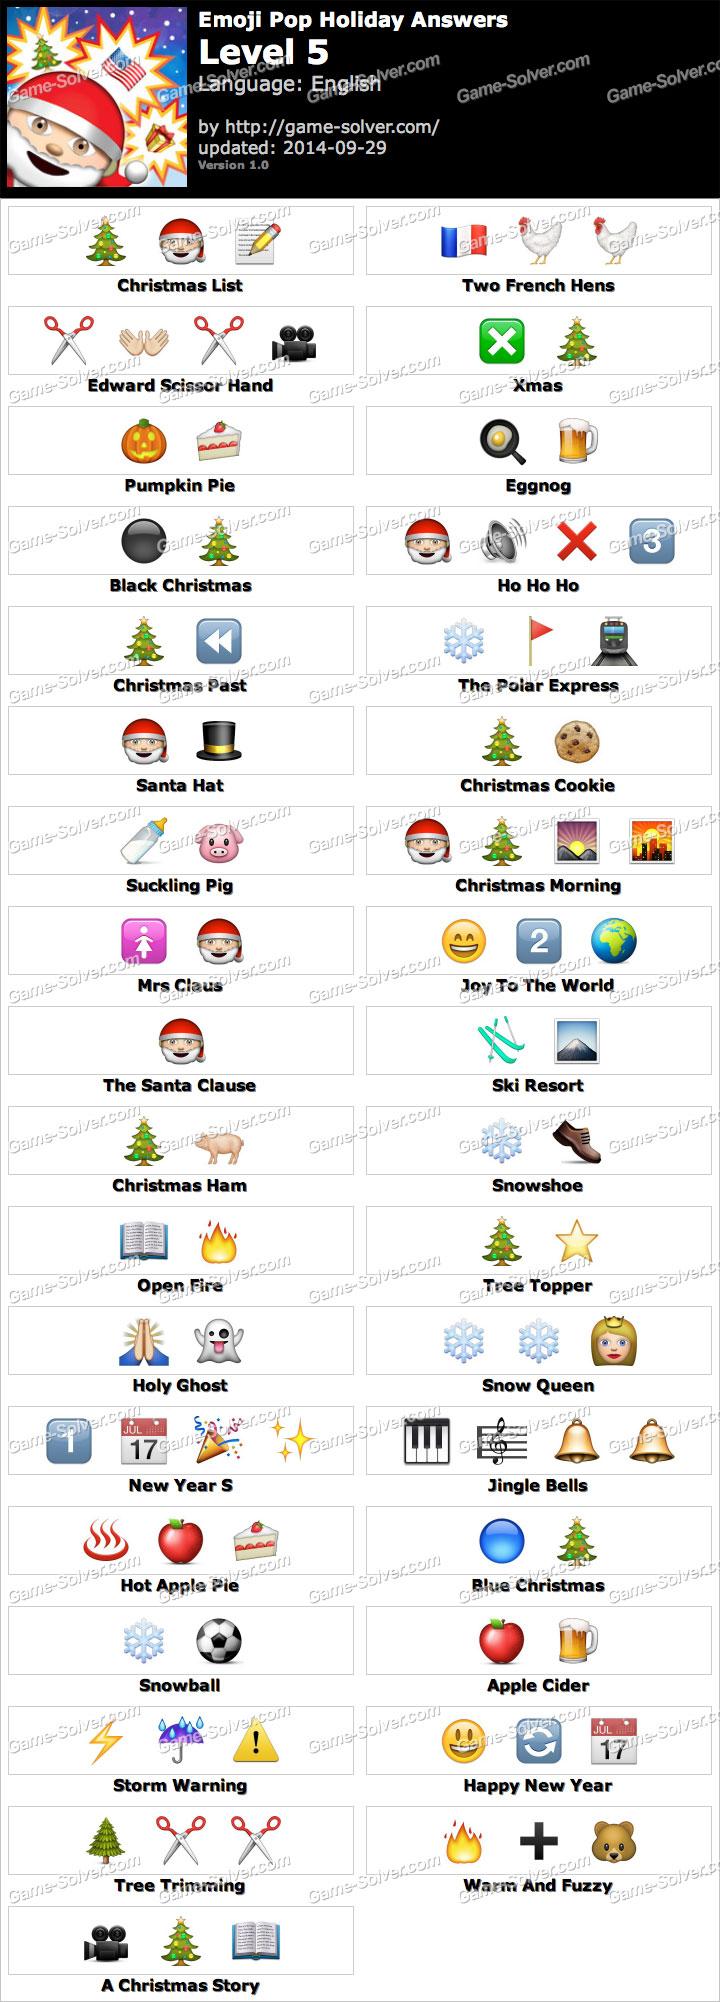 emoji pop holiday edition level 5